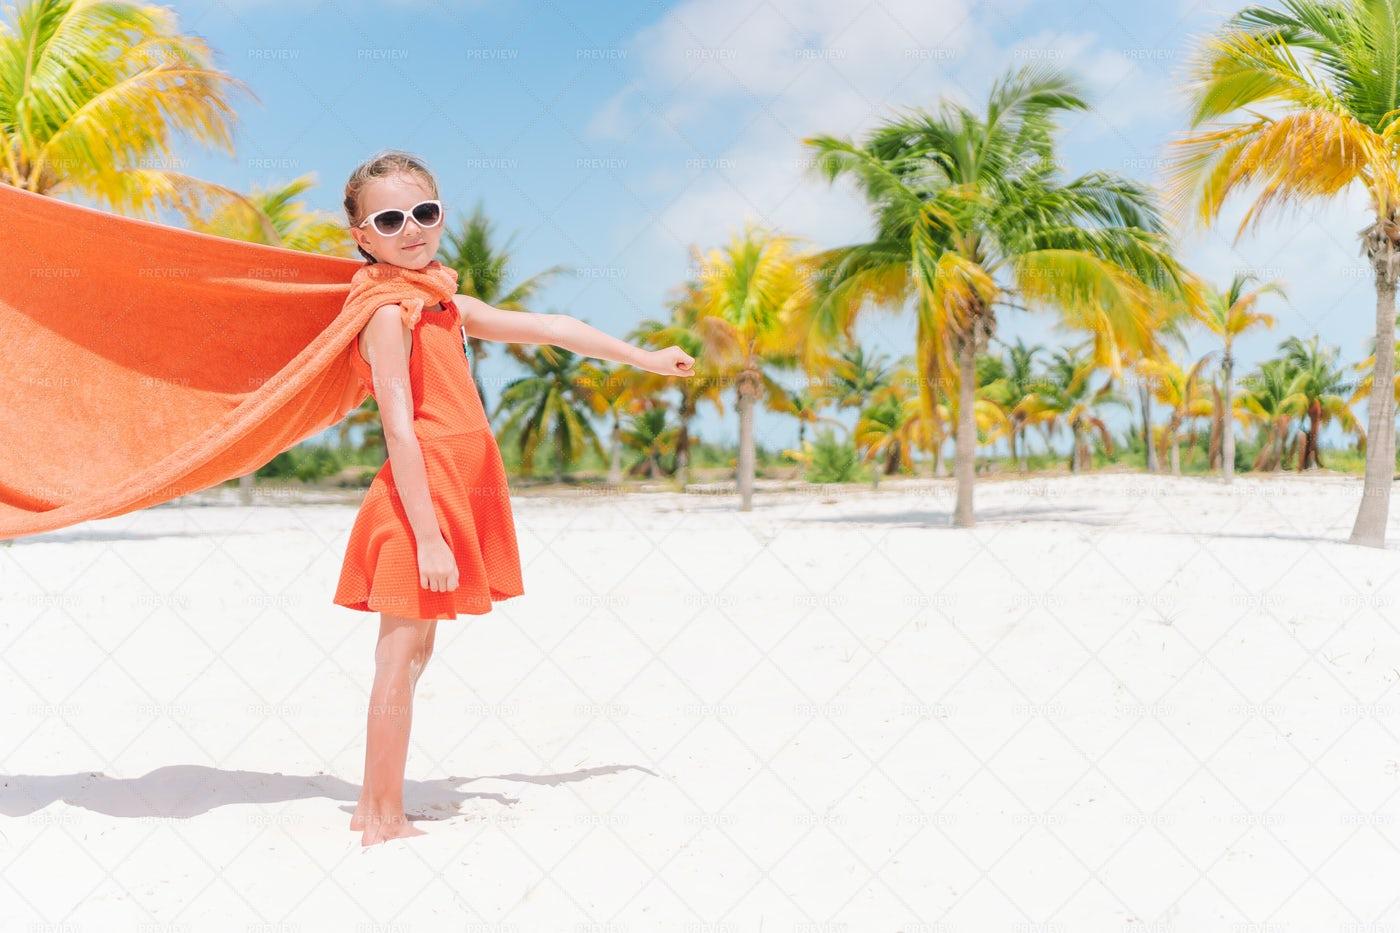 Child Superhero On Beach: Stock Photos